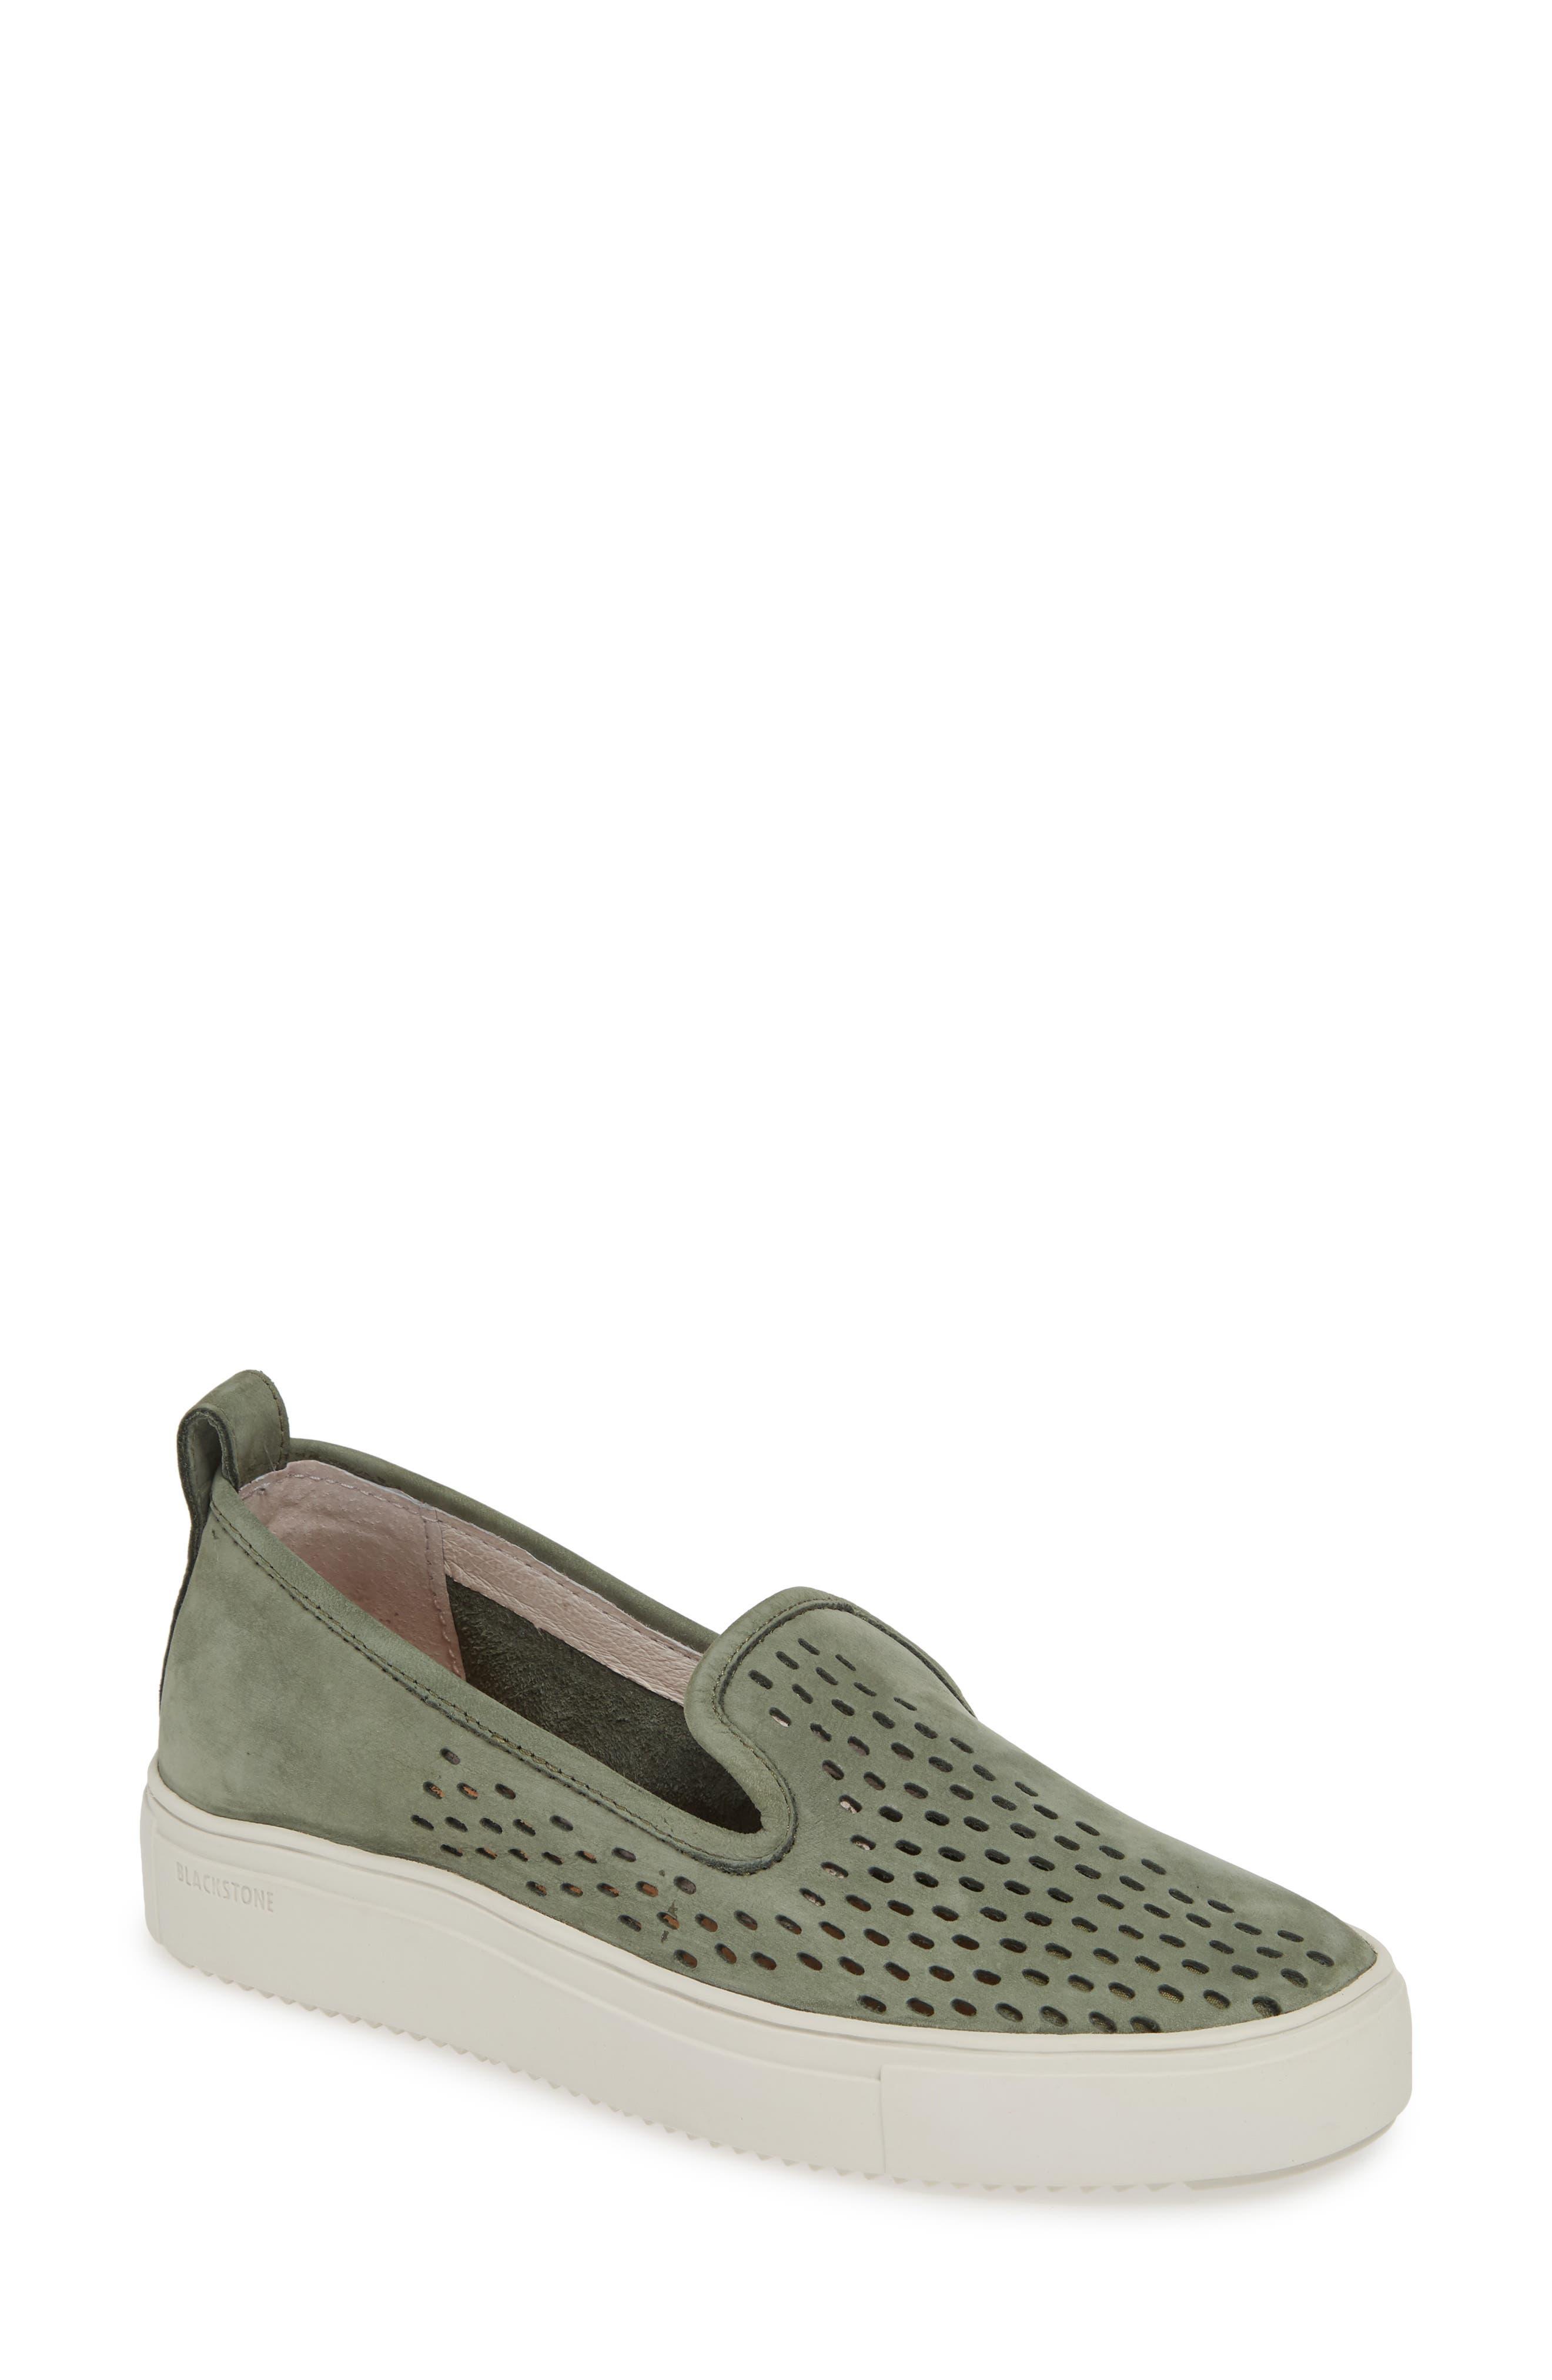 Blackstone Rl68 Perforated Slip-On Sneaker, Green